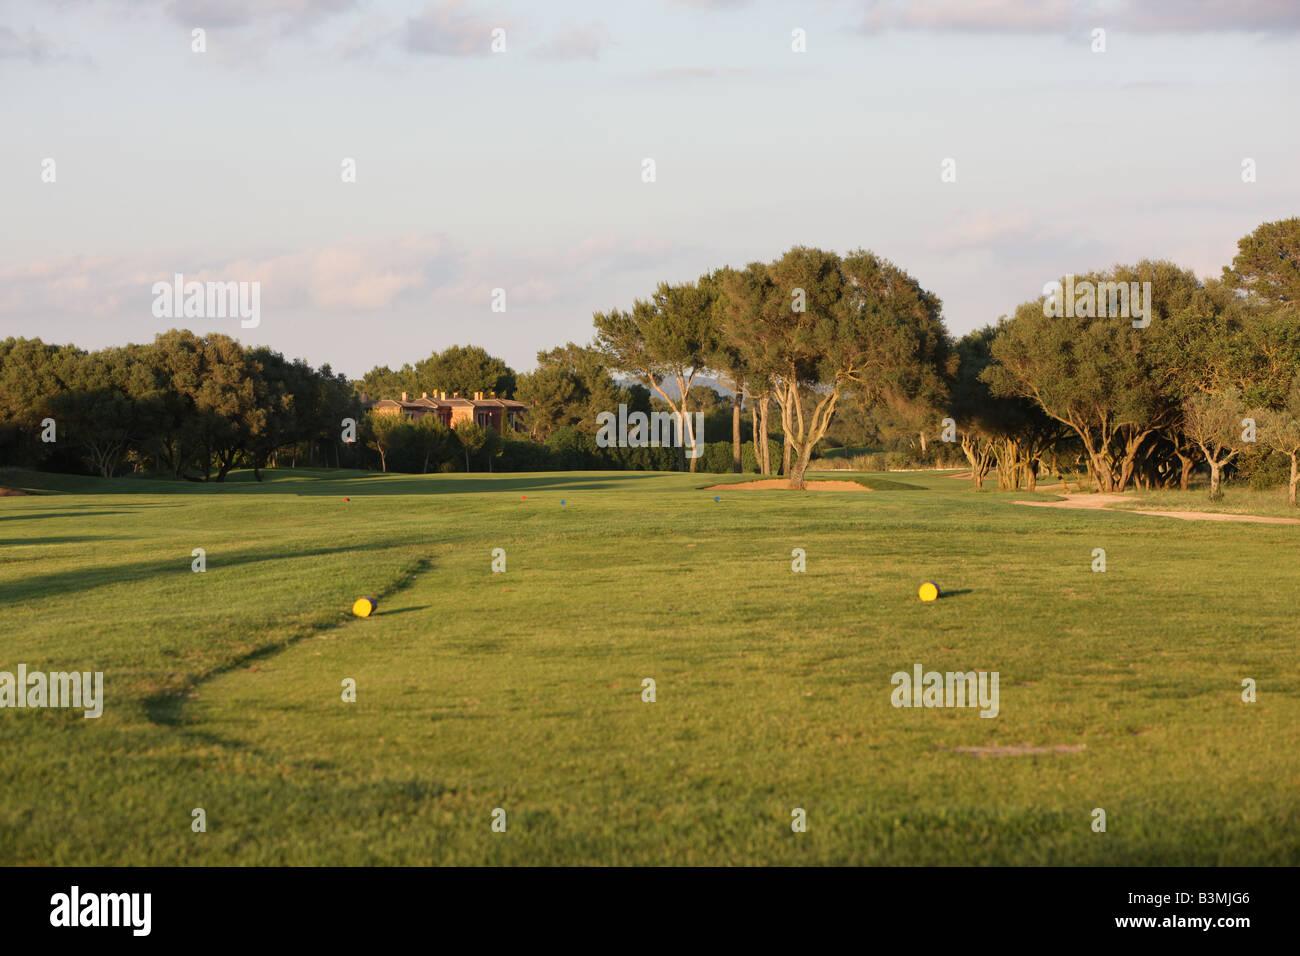 Golf Tee leading on to fairway - Stock Image